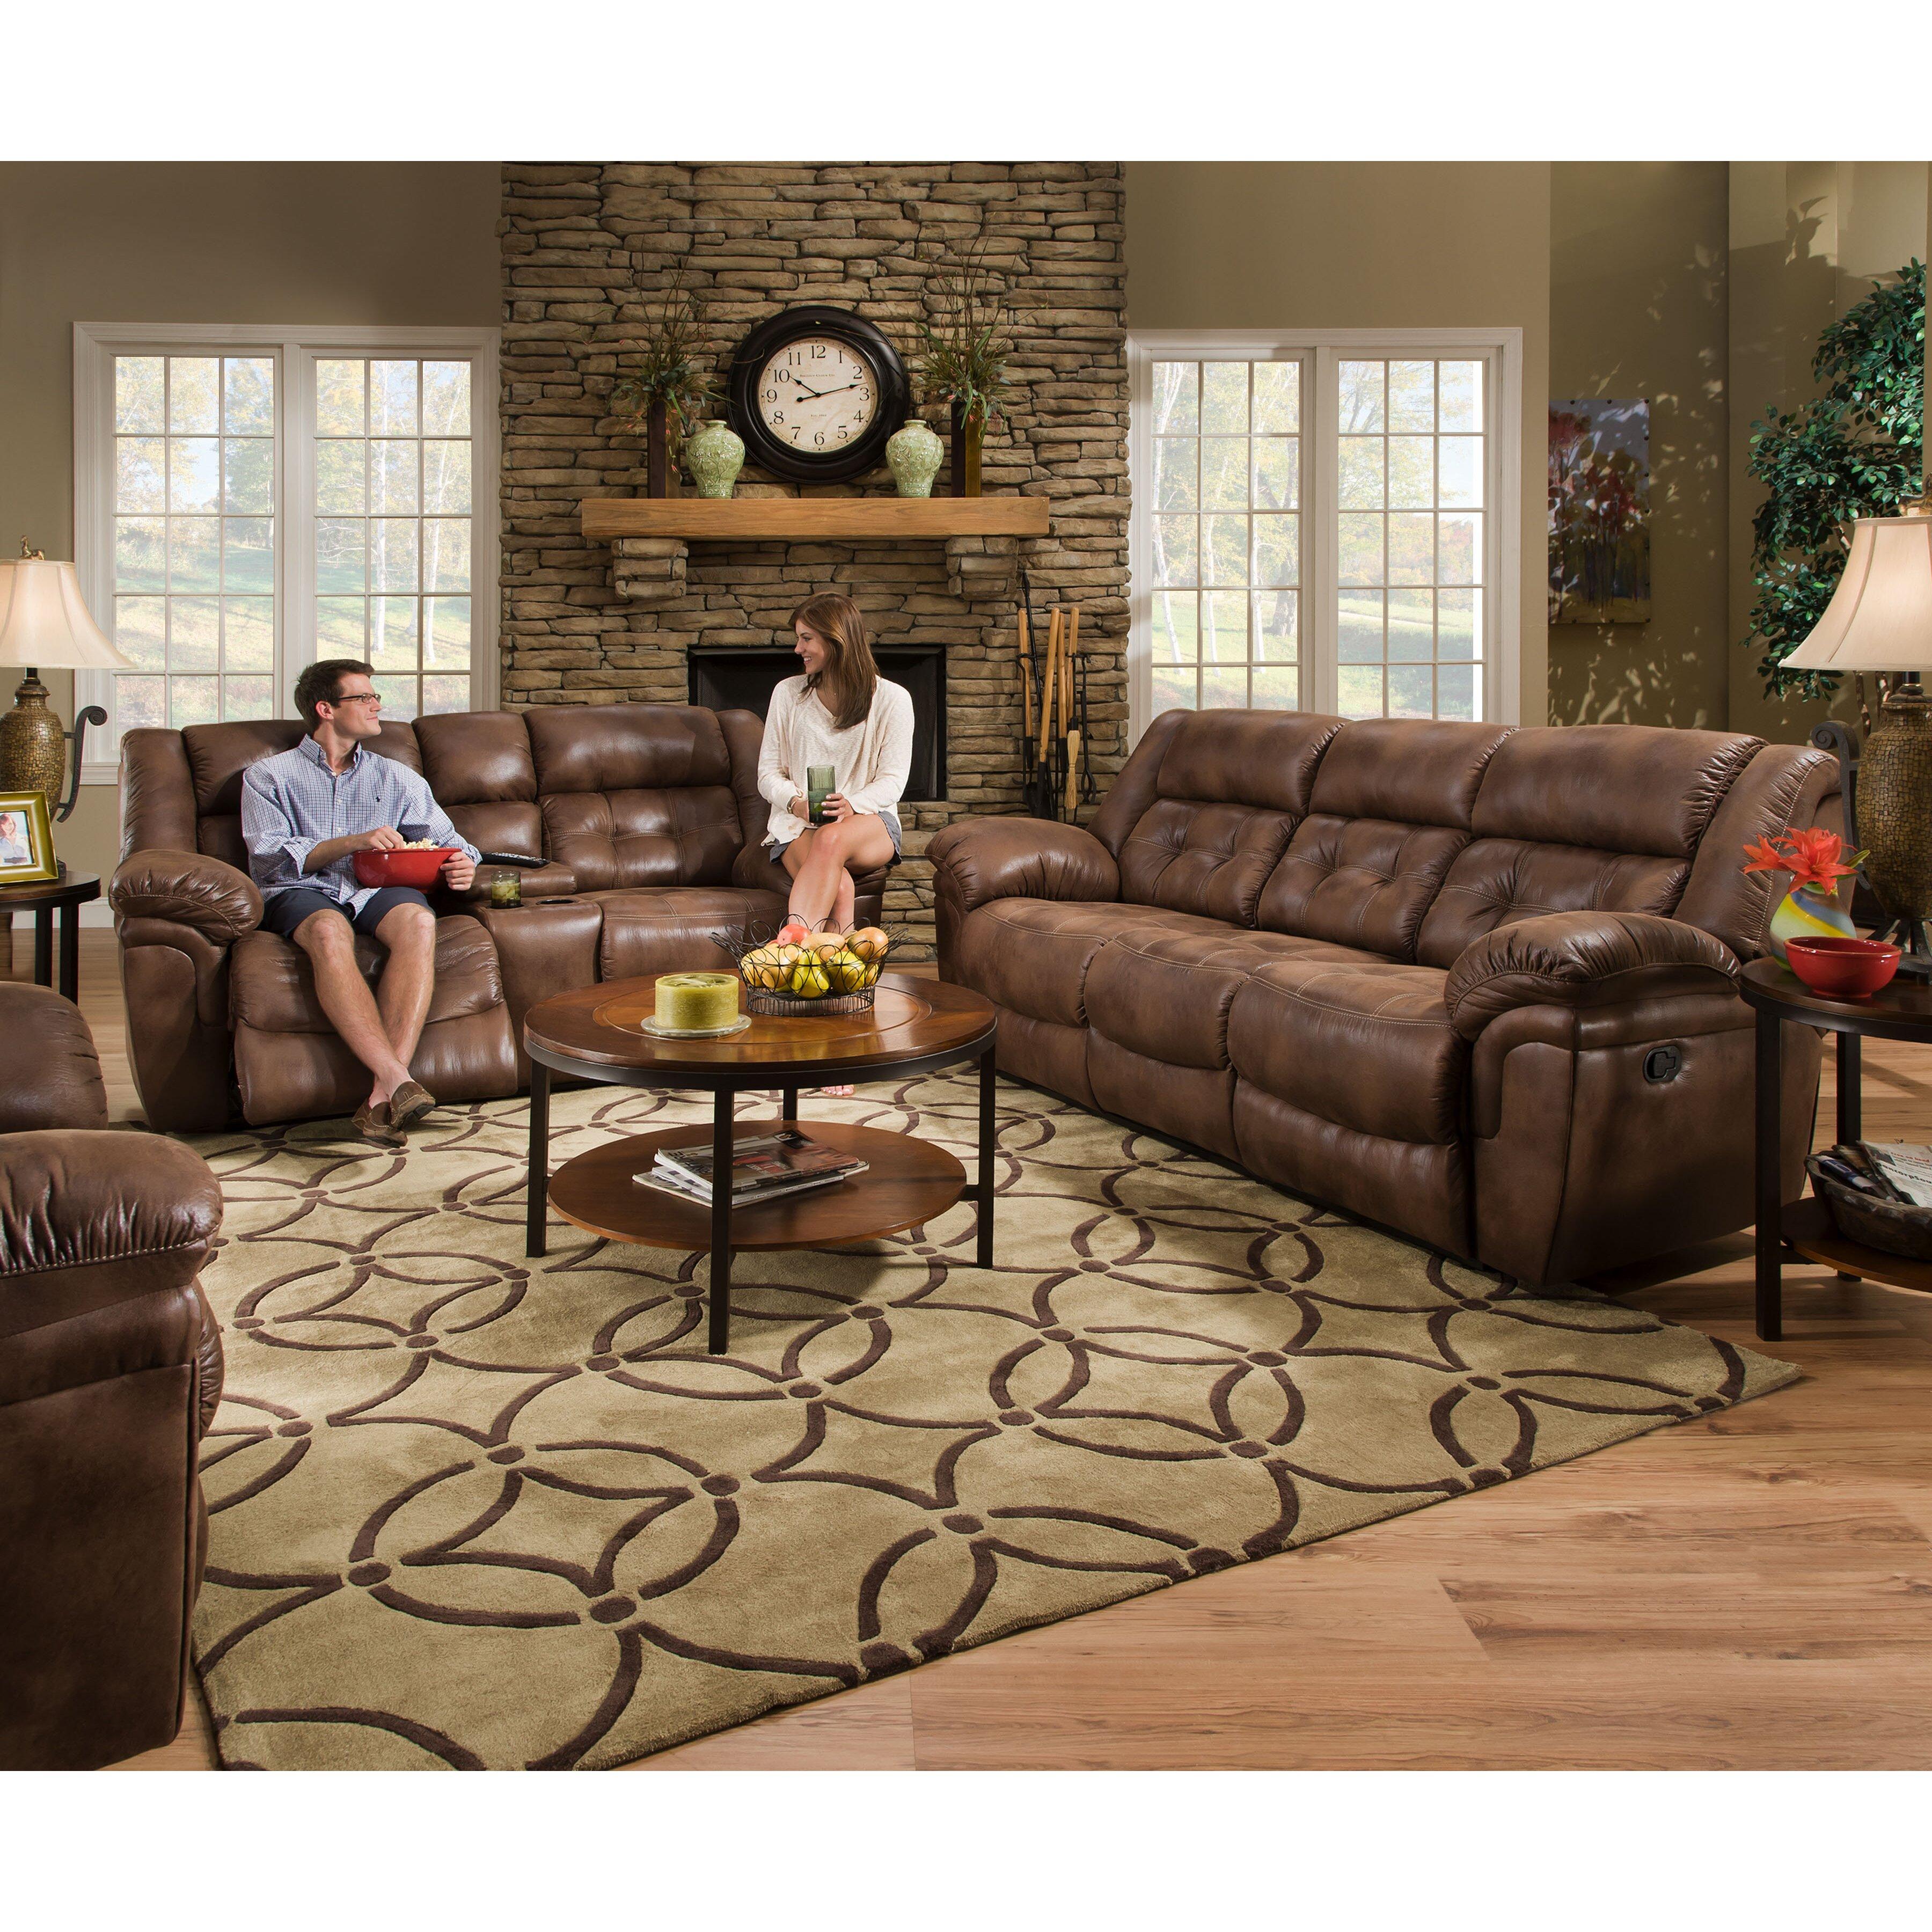 Wayfair Living Room Sets Power Reclining Living Room Sets Youll Love Wayfair